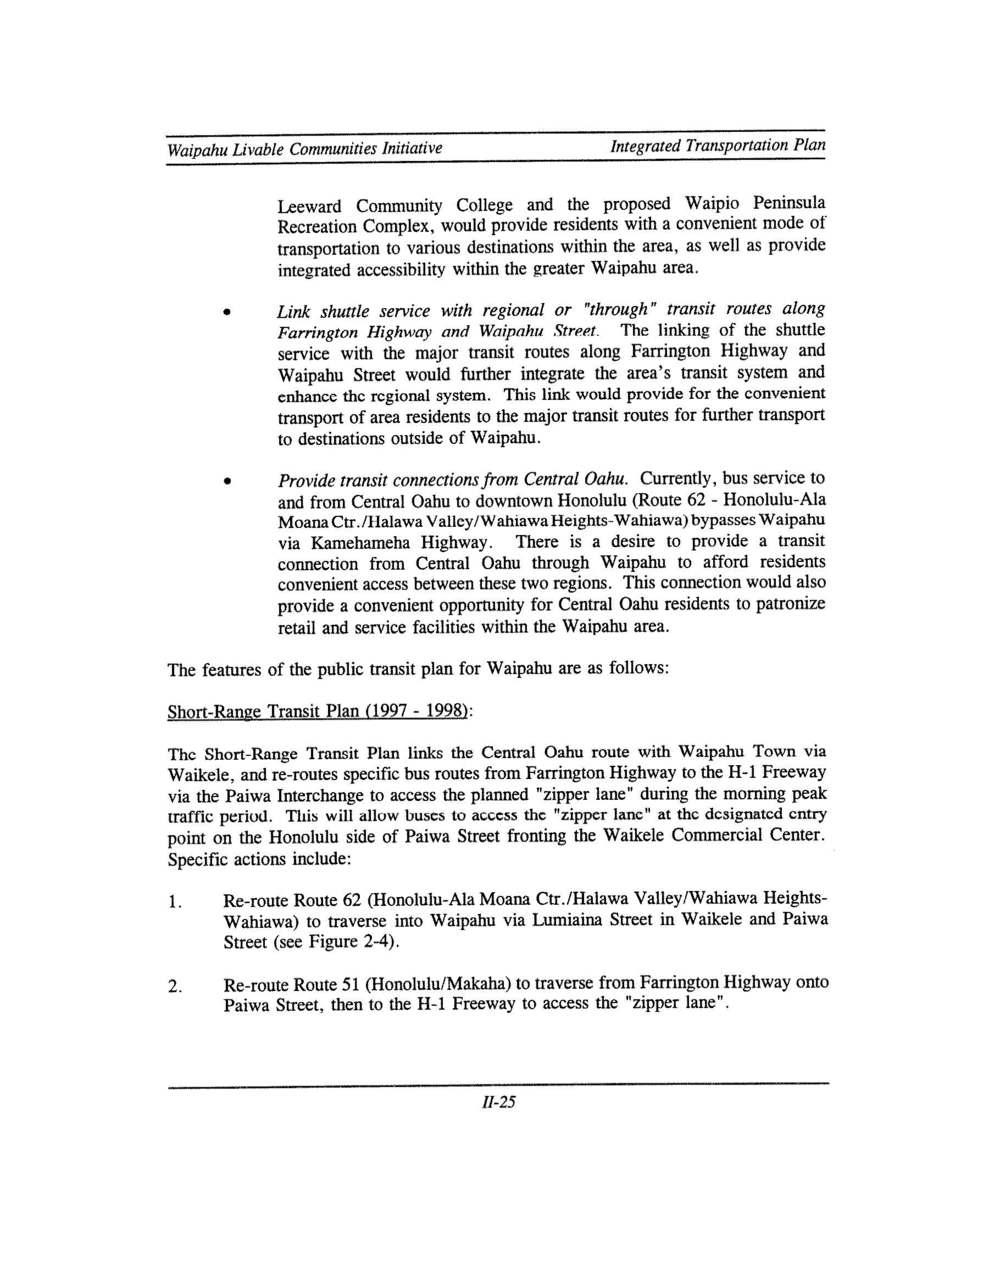 160531_WaipahuLivableCommunities(1998)_Page_040.jpg